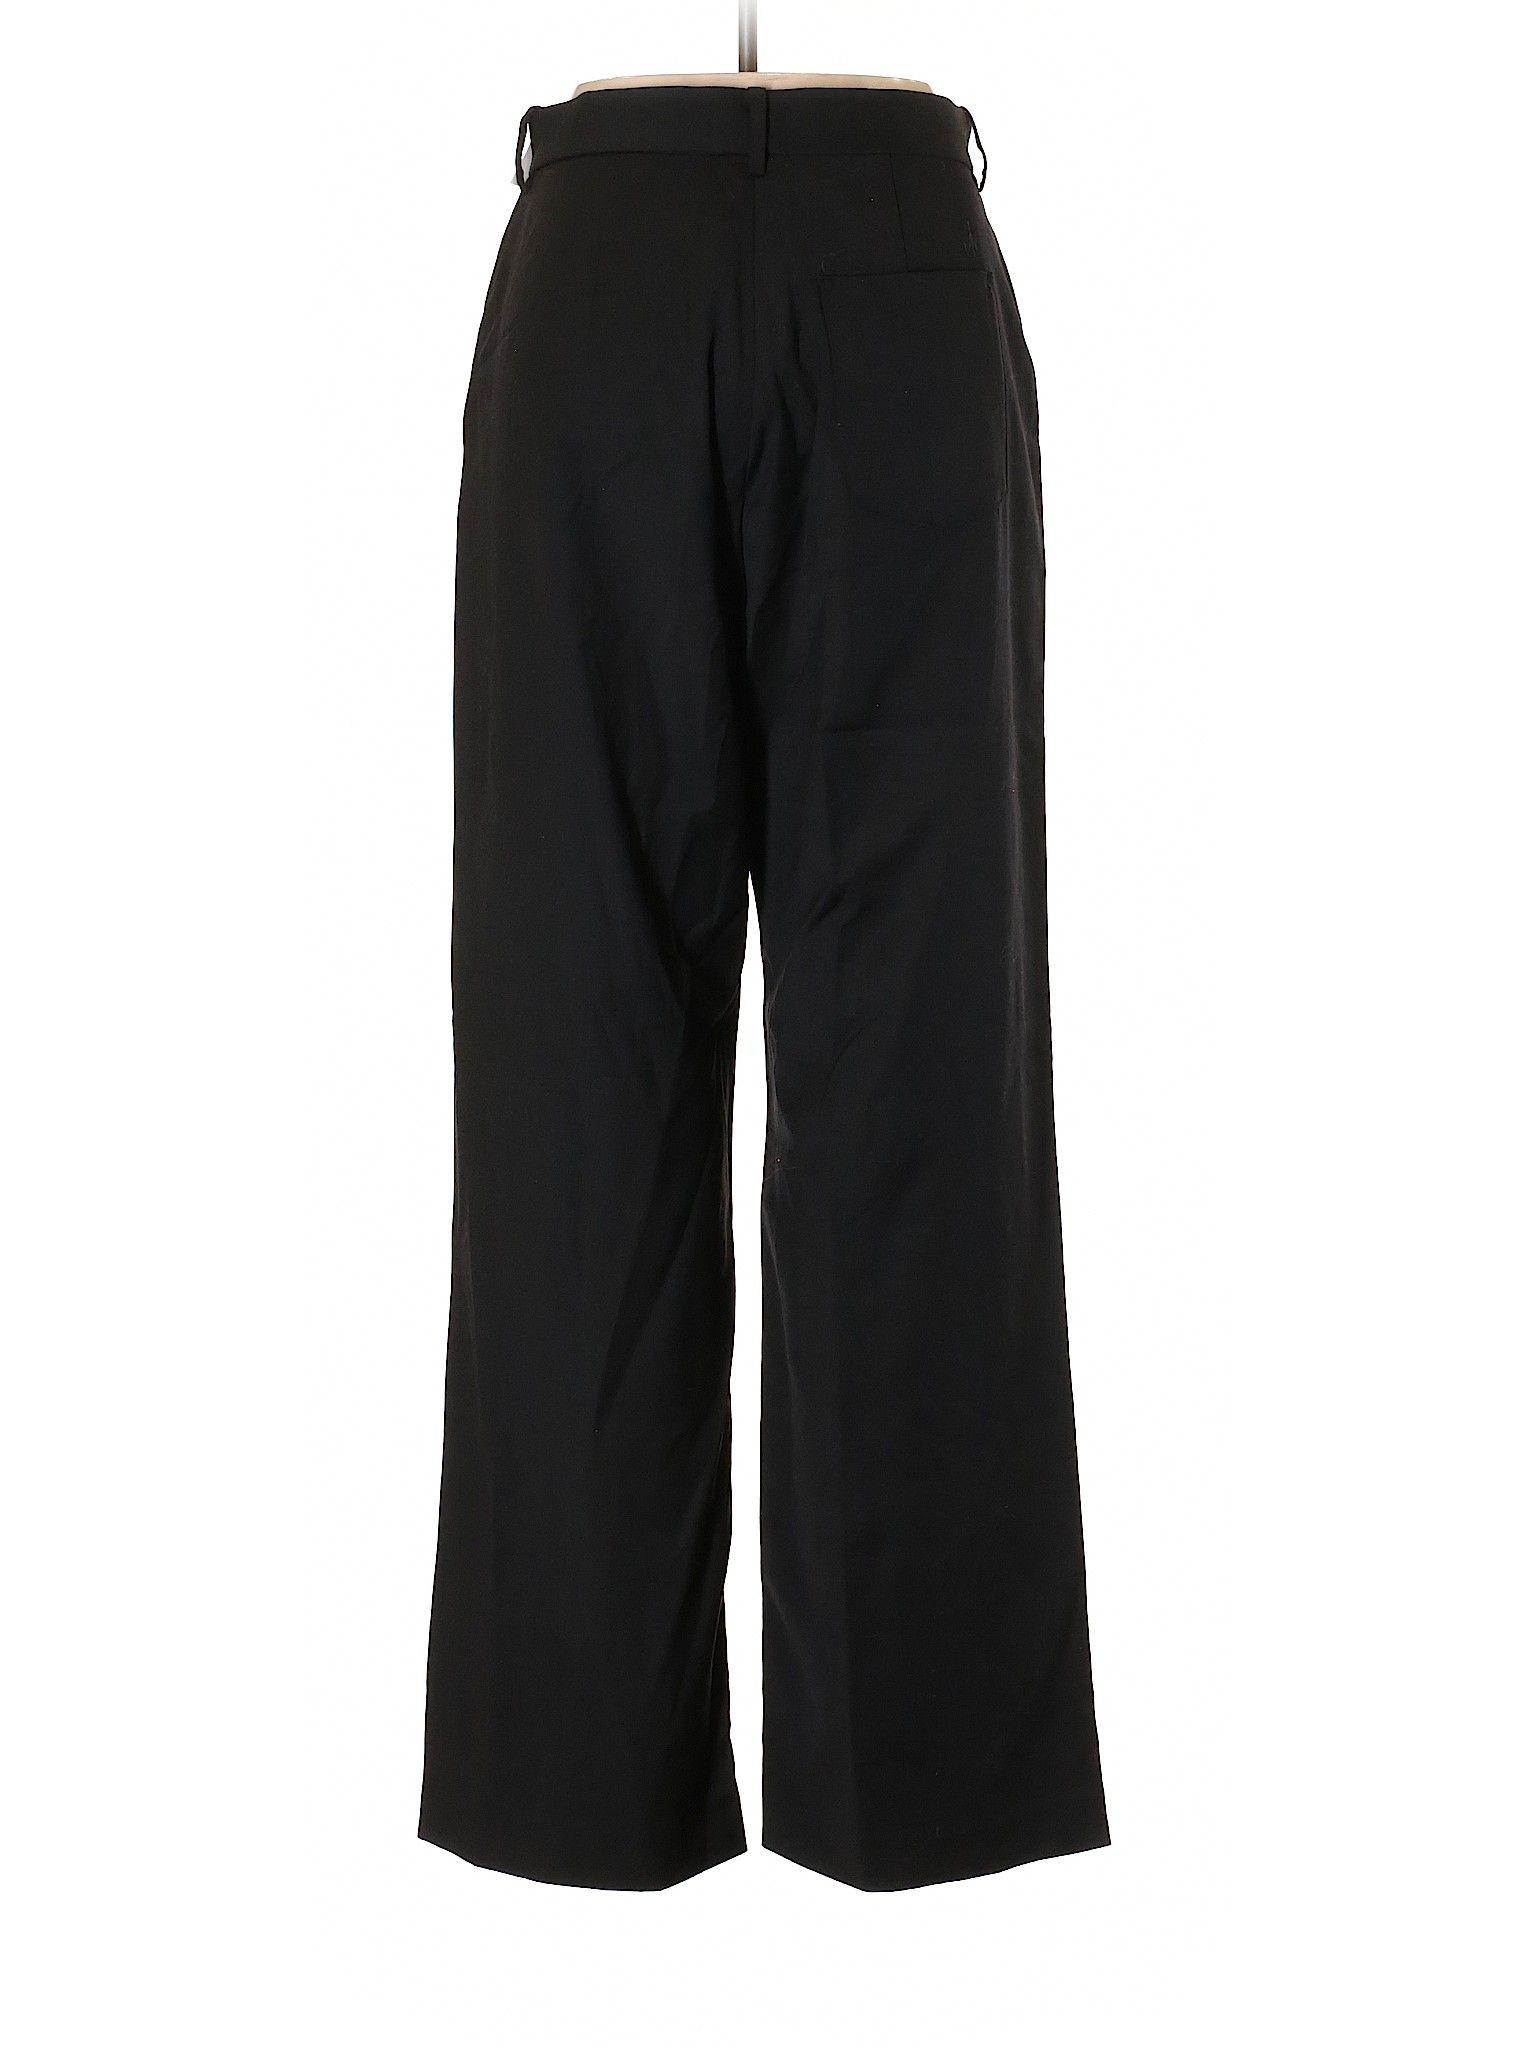 Dress pants products pinterest dress pants pants and dresses